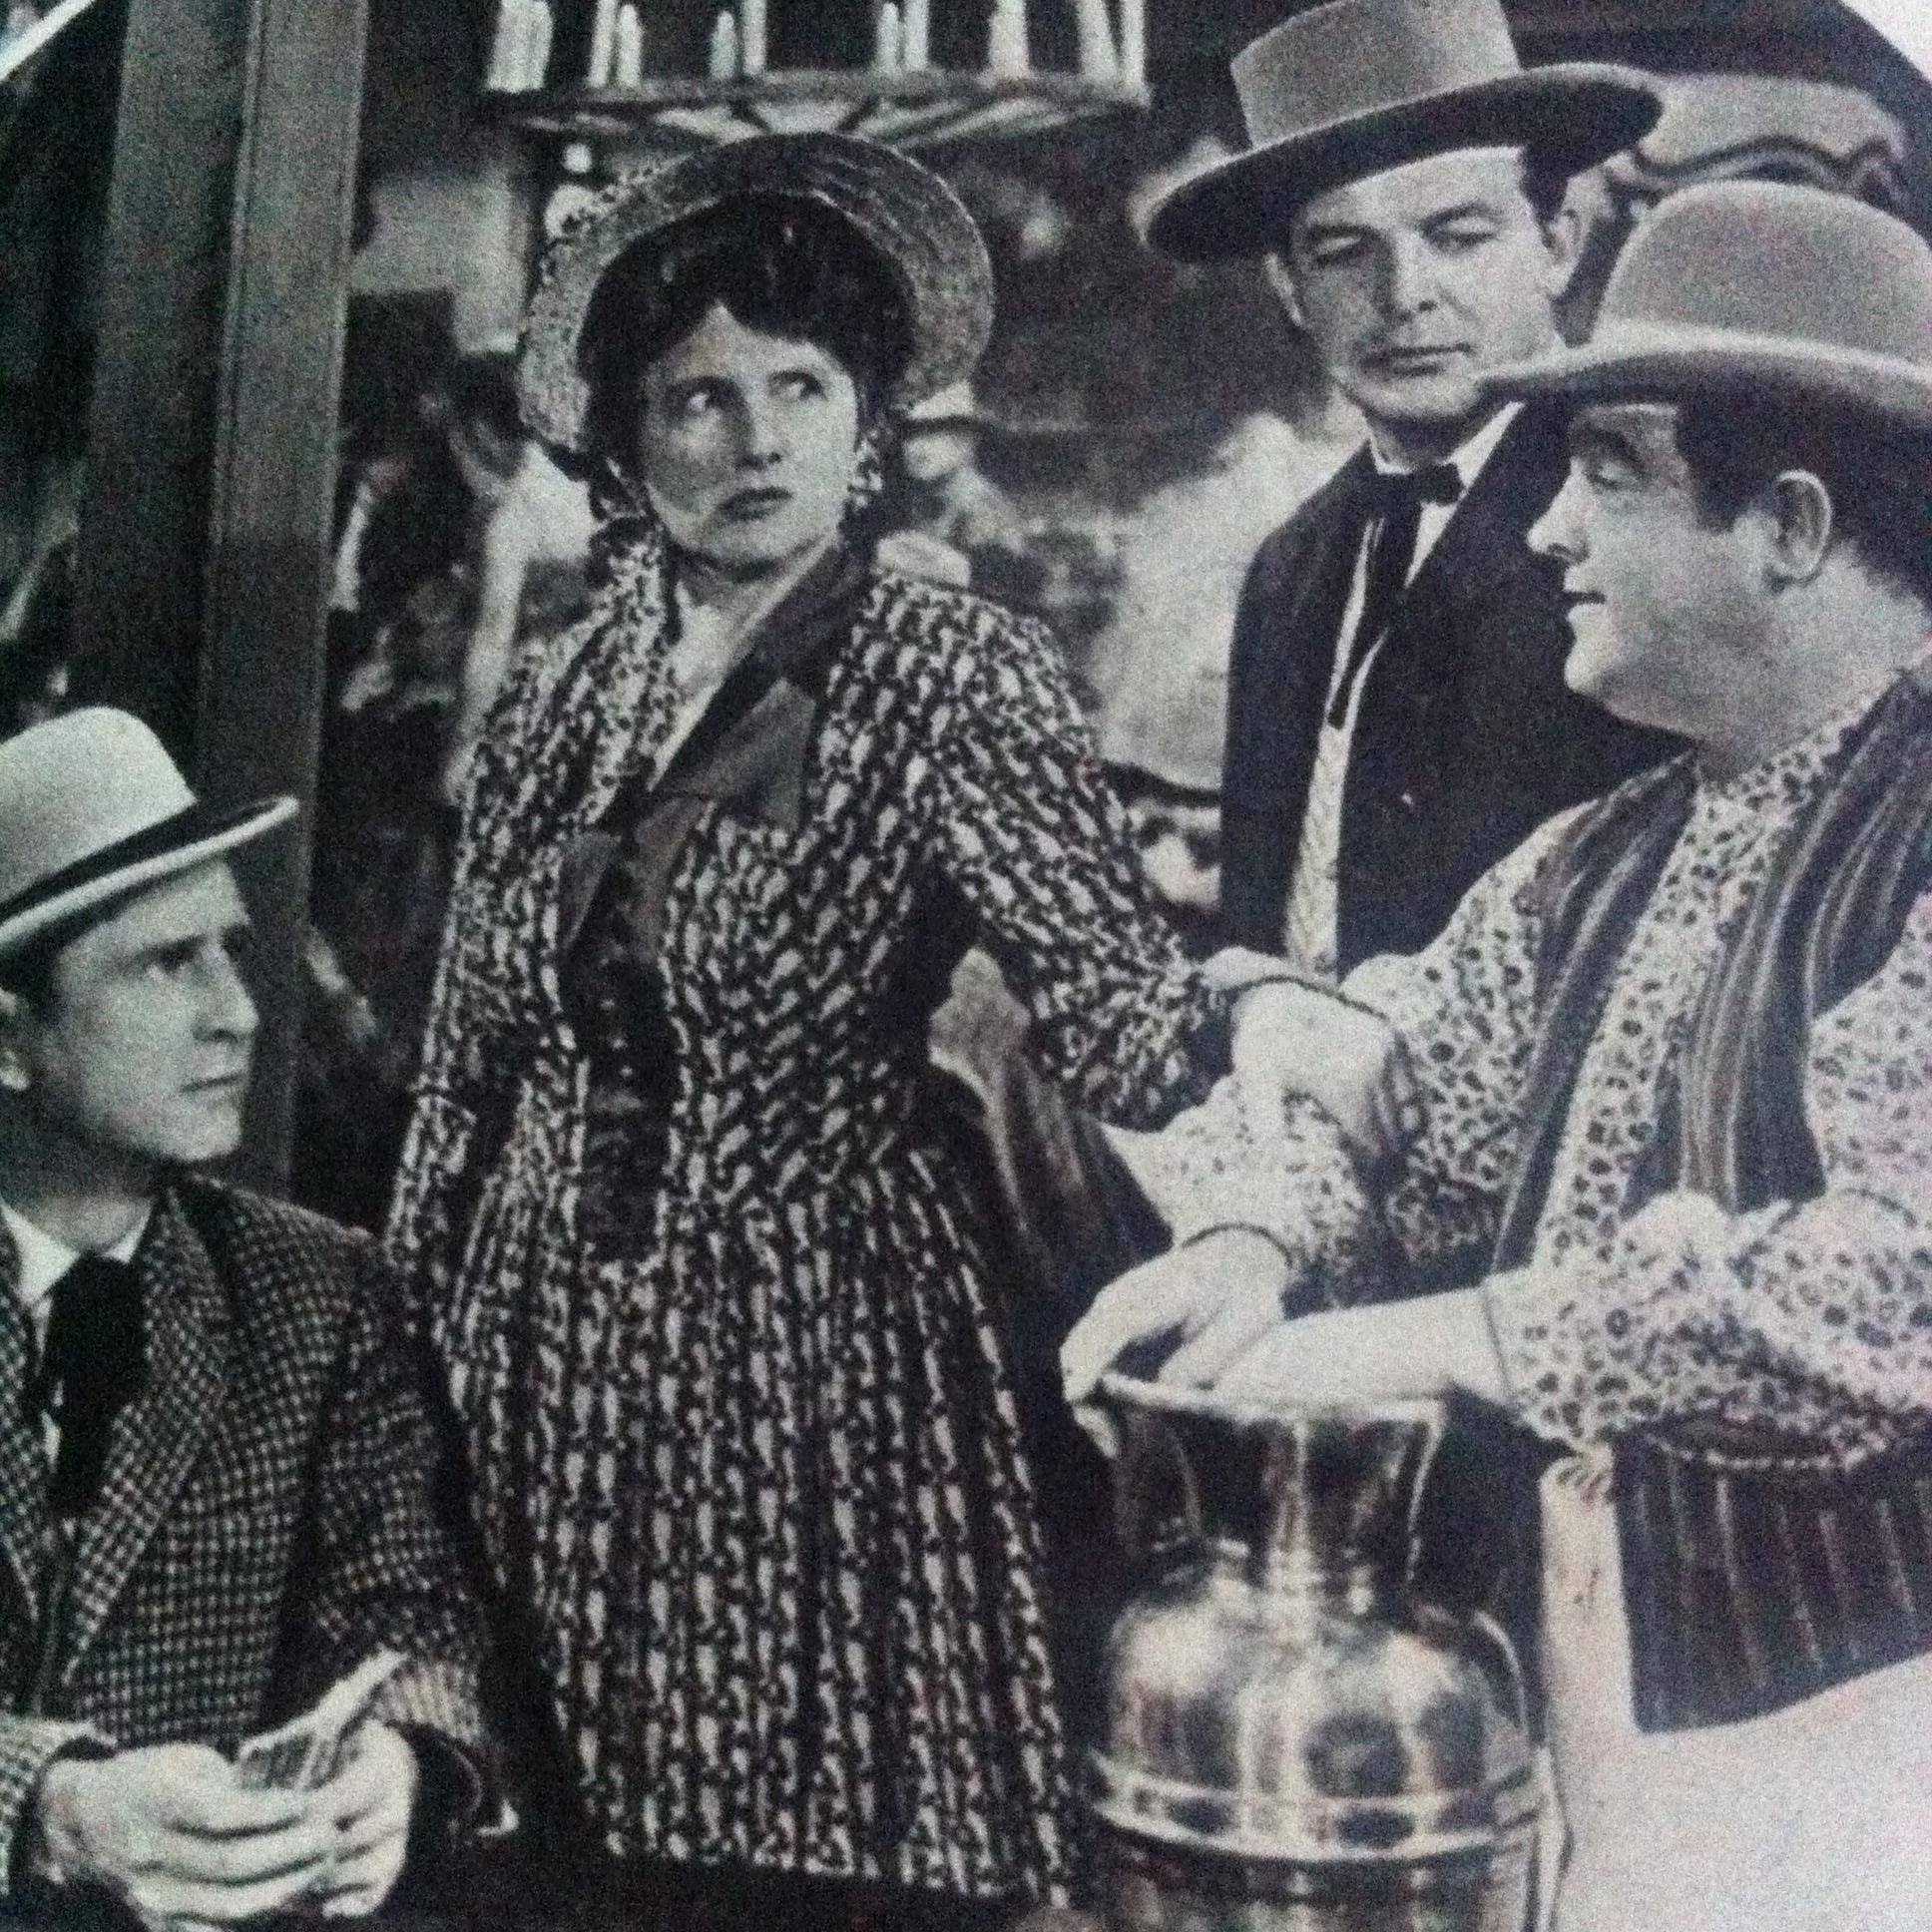 Bud Abbott, Lou Costello, Gordon Jones, and Marjorie Main in The Wistful Widow of Wagon Gap (1947)